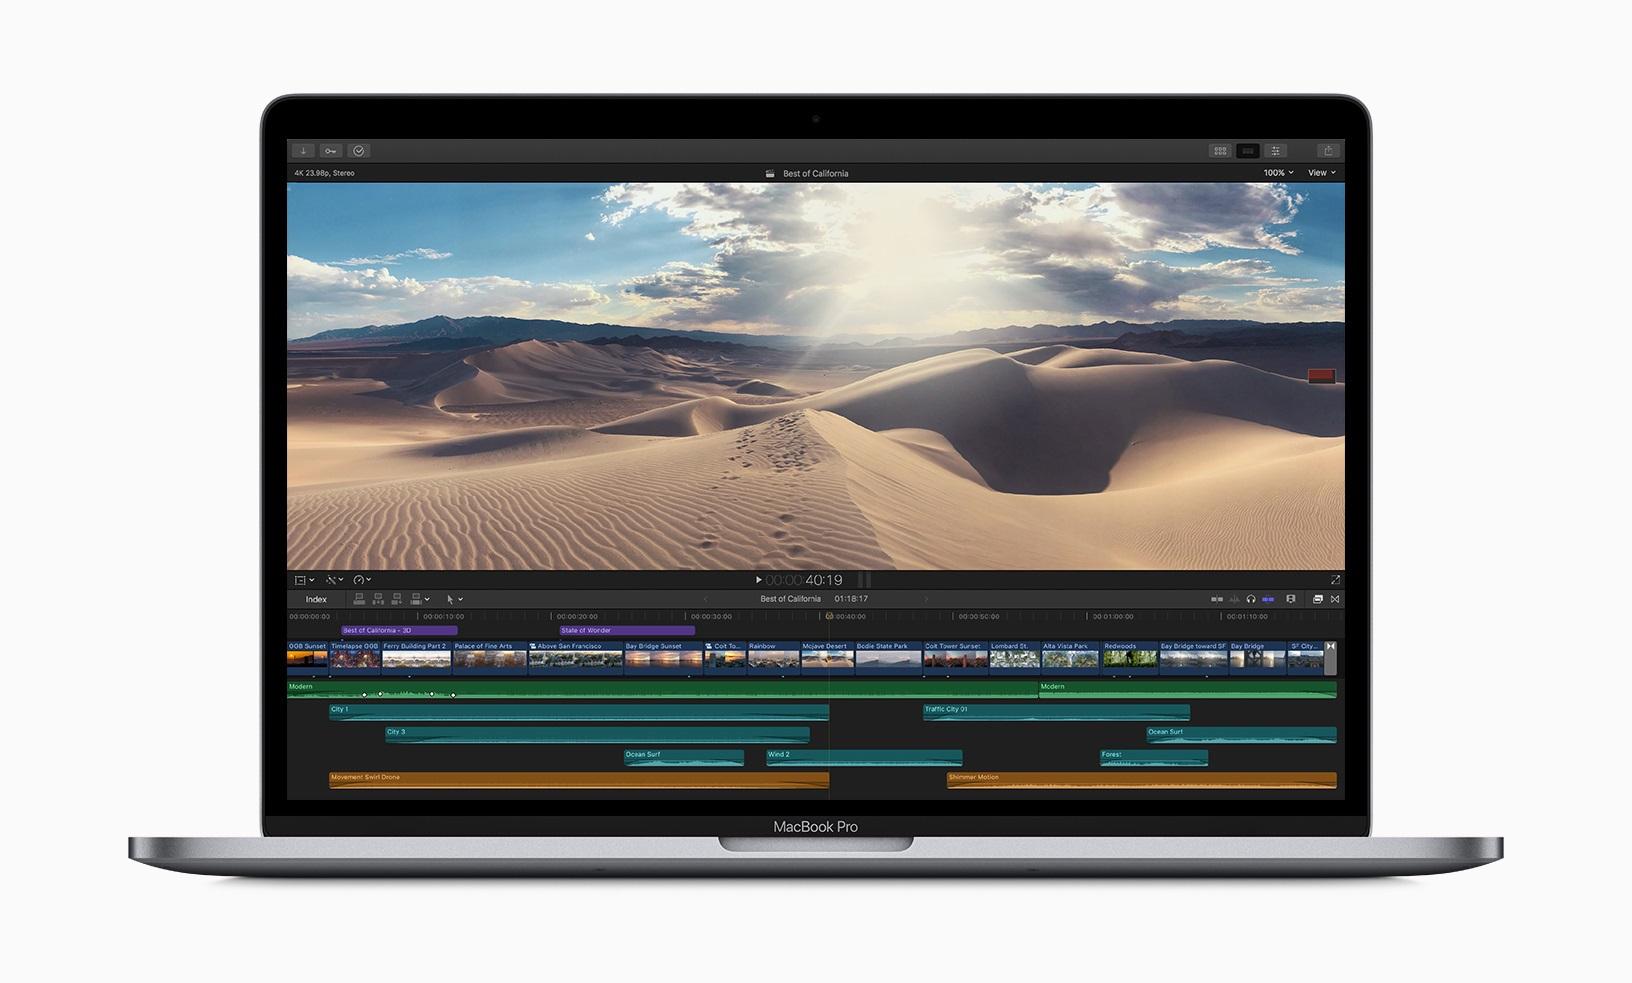 apple_macbookpro-8-core_video-editing_05212019